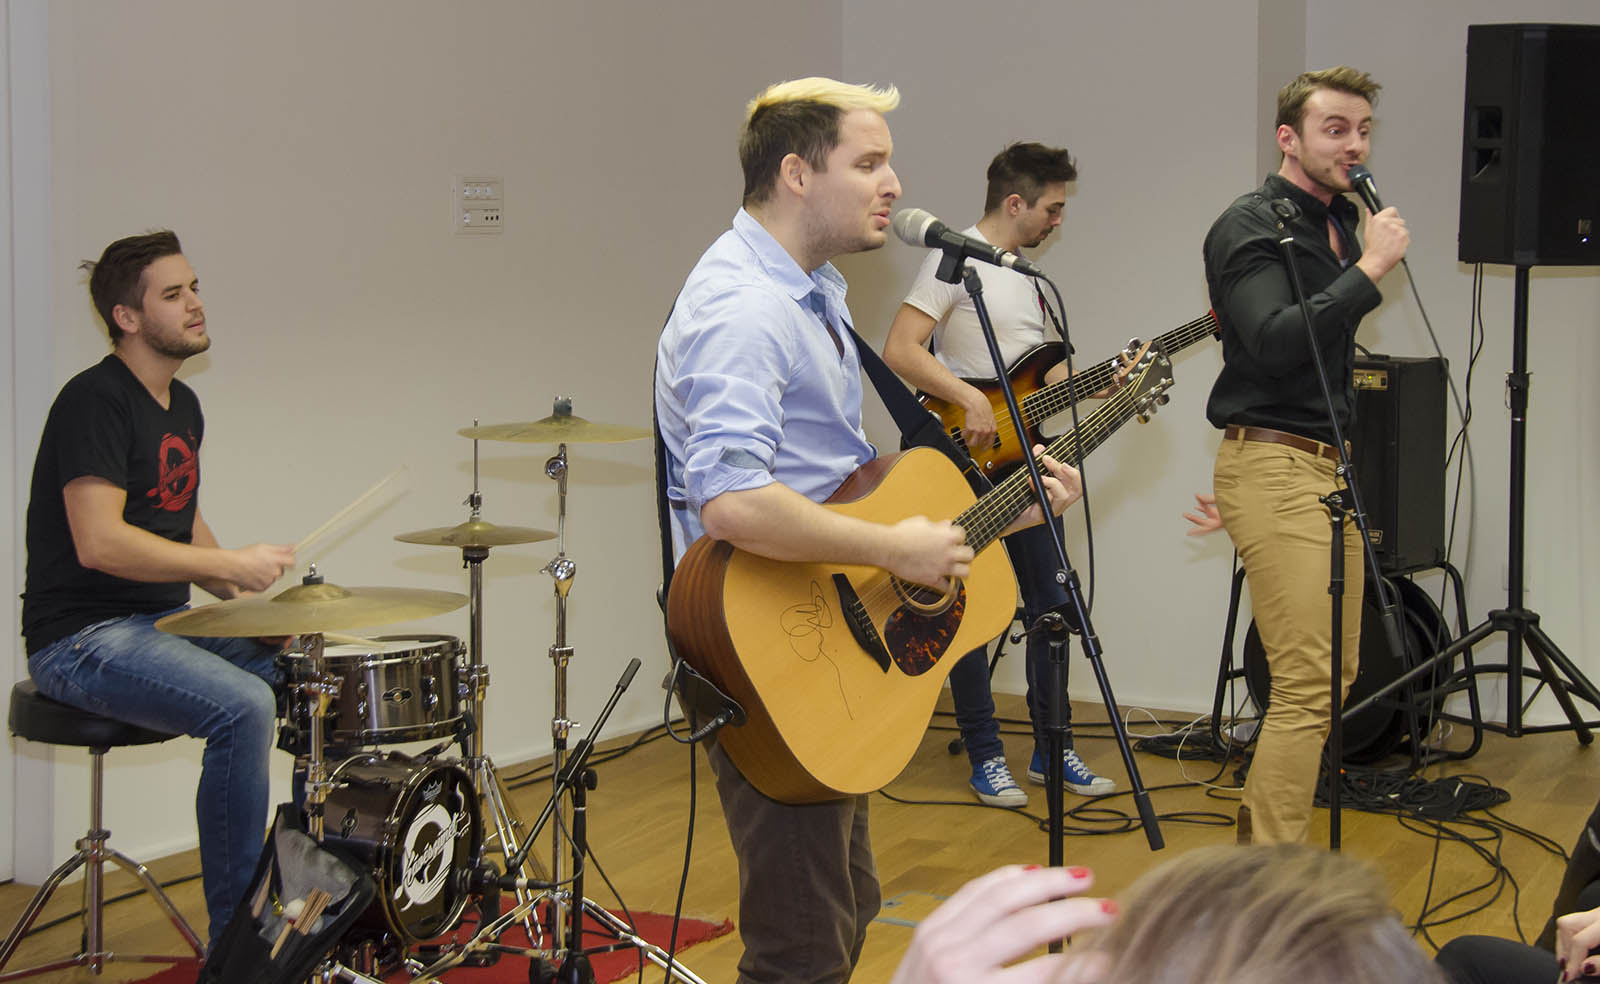 Koncert U Madjarskom Institutu (2)